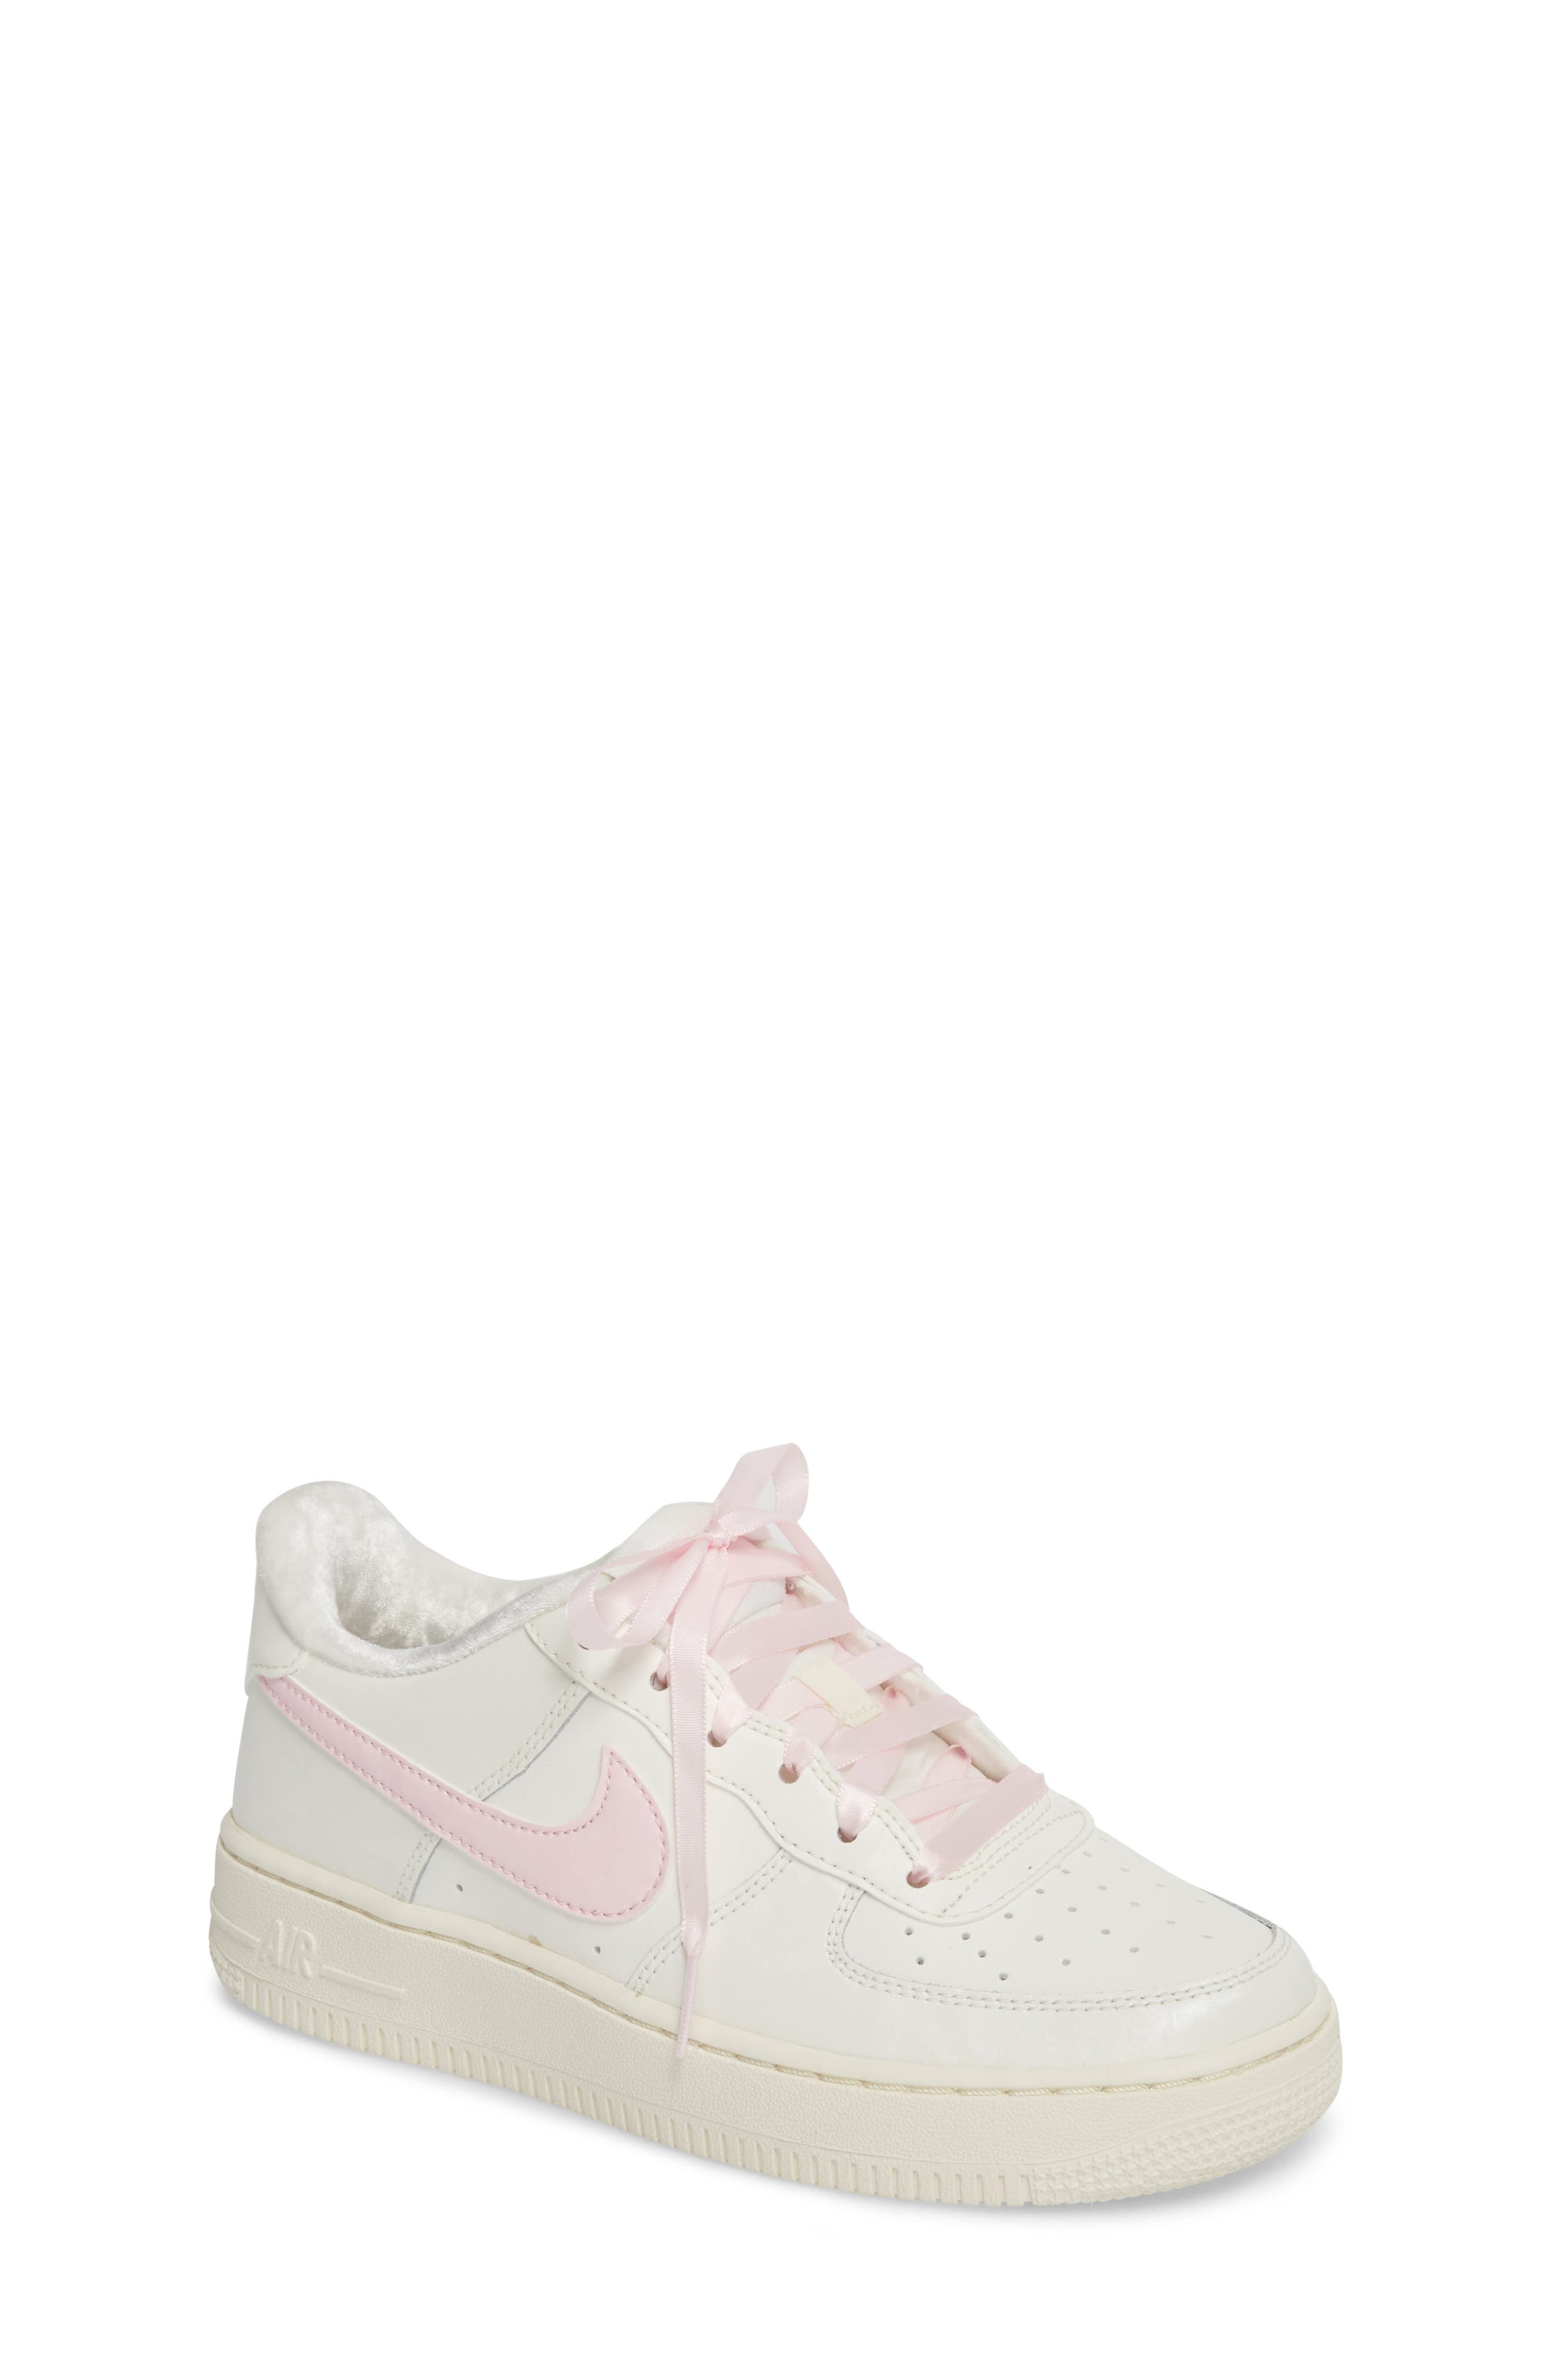 Air Force 1 '06 Sneaker,                             Main thumbnail 1, color,                             Sail/ Arctic Pink